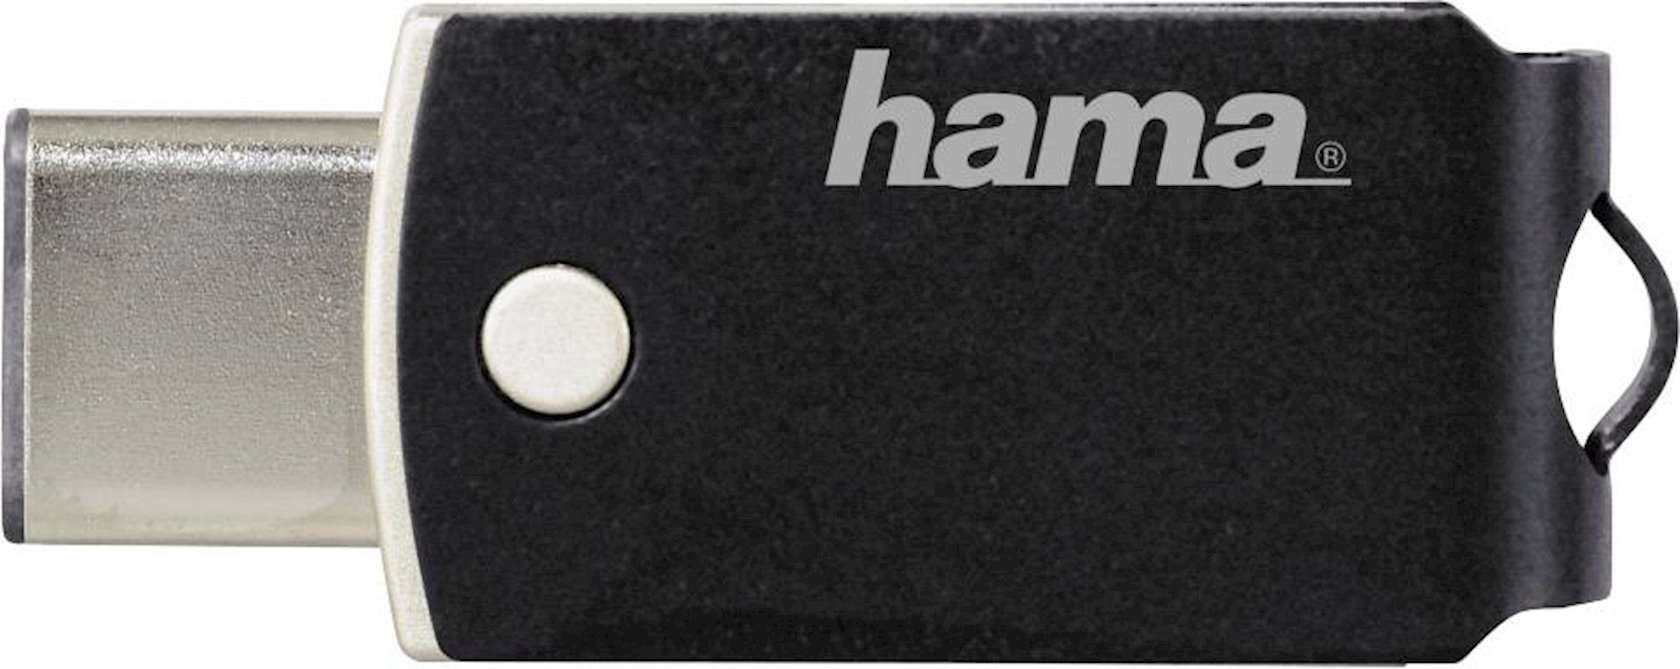 USB-Fleş kart Hama C - Turn 32 Gb Usb 3.1/3.0